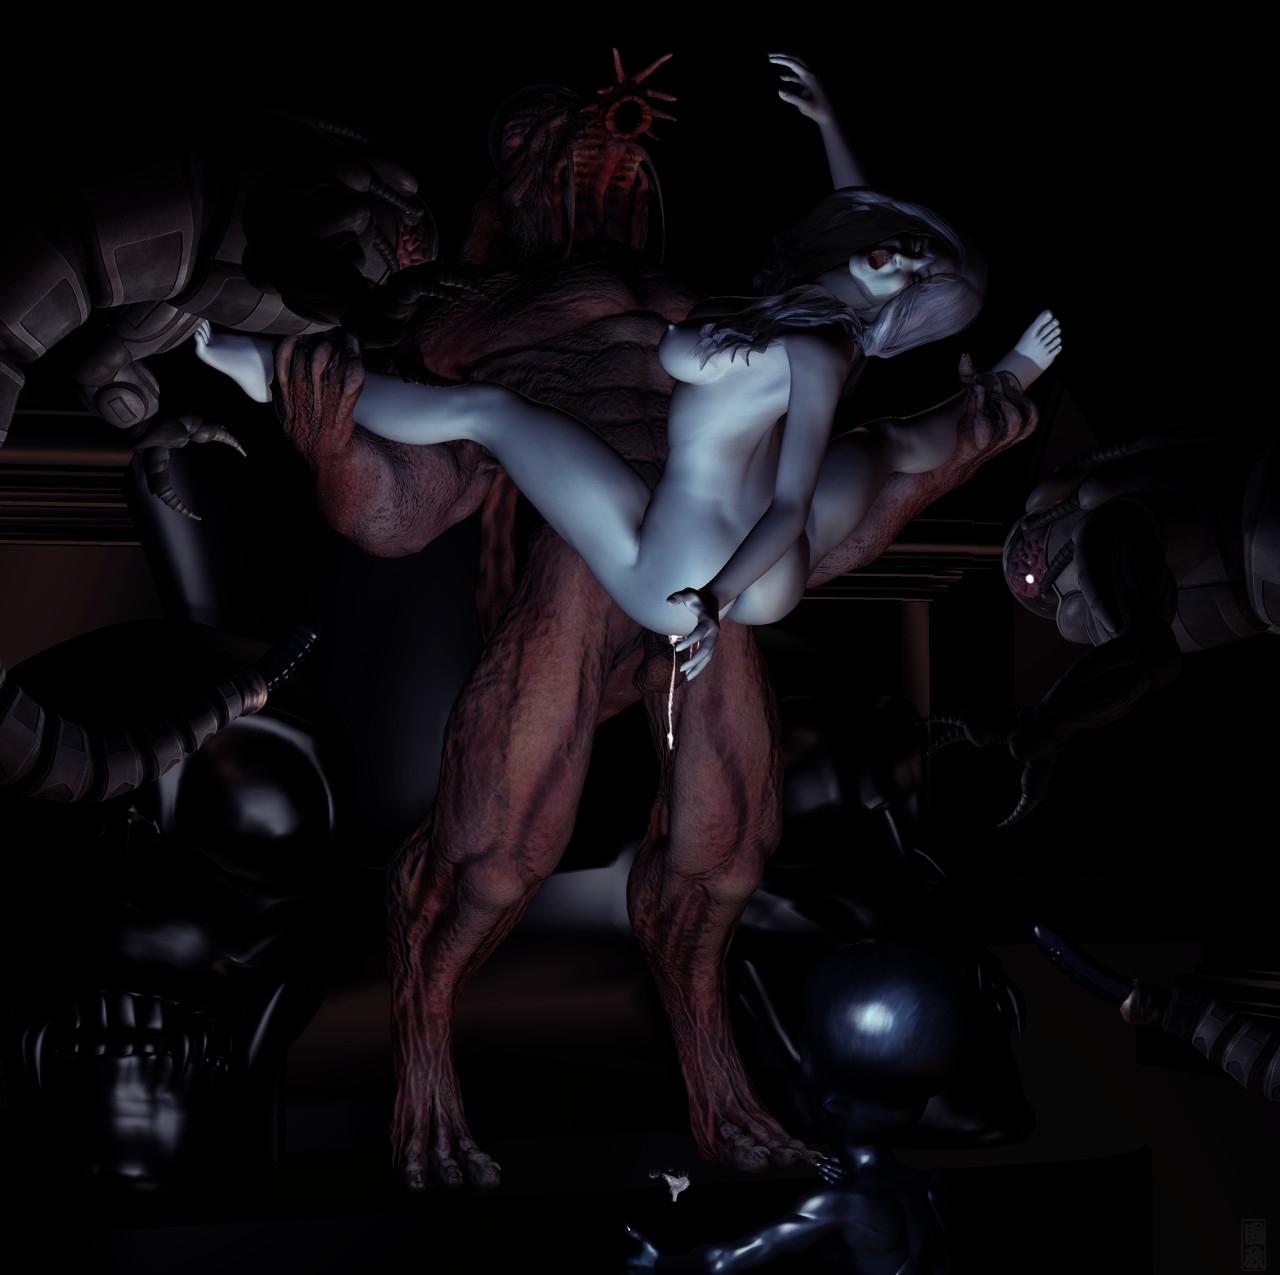 Alien xxx moster hentia image